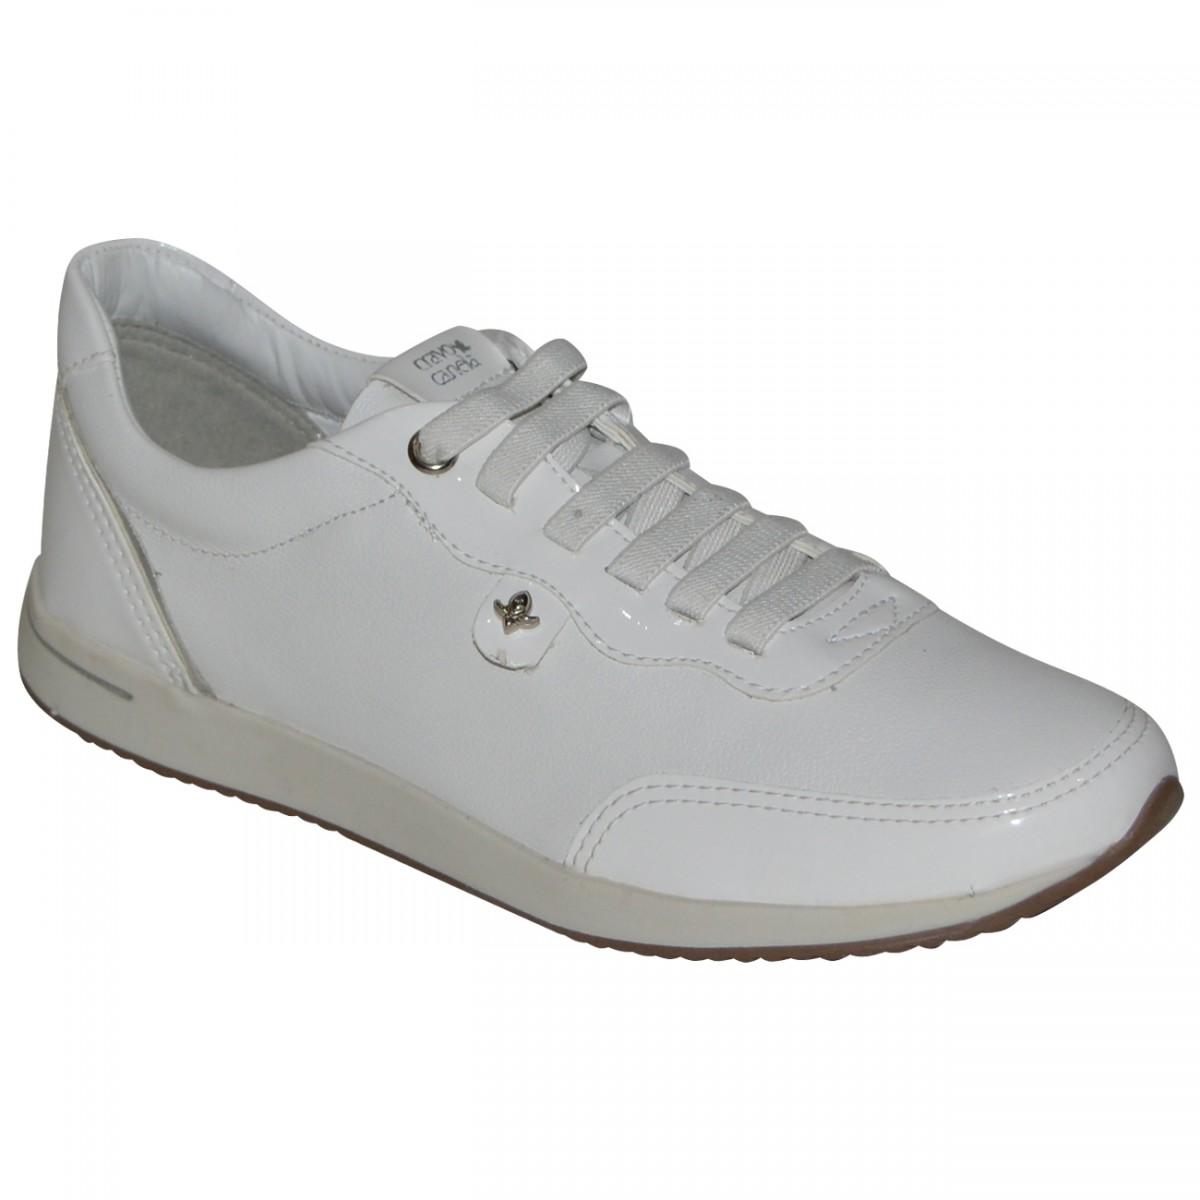 Tenis Cravo e Canela 97608 97608-5 - Branco - Chuteira Nike 3ec745b39919e